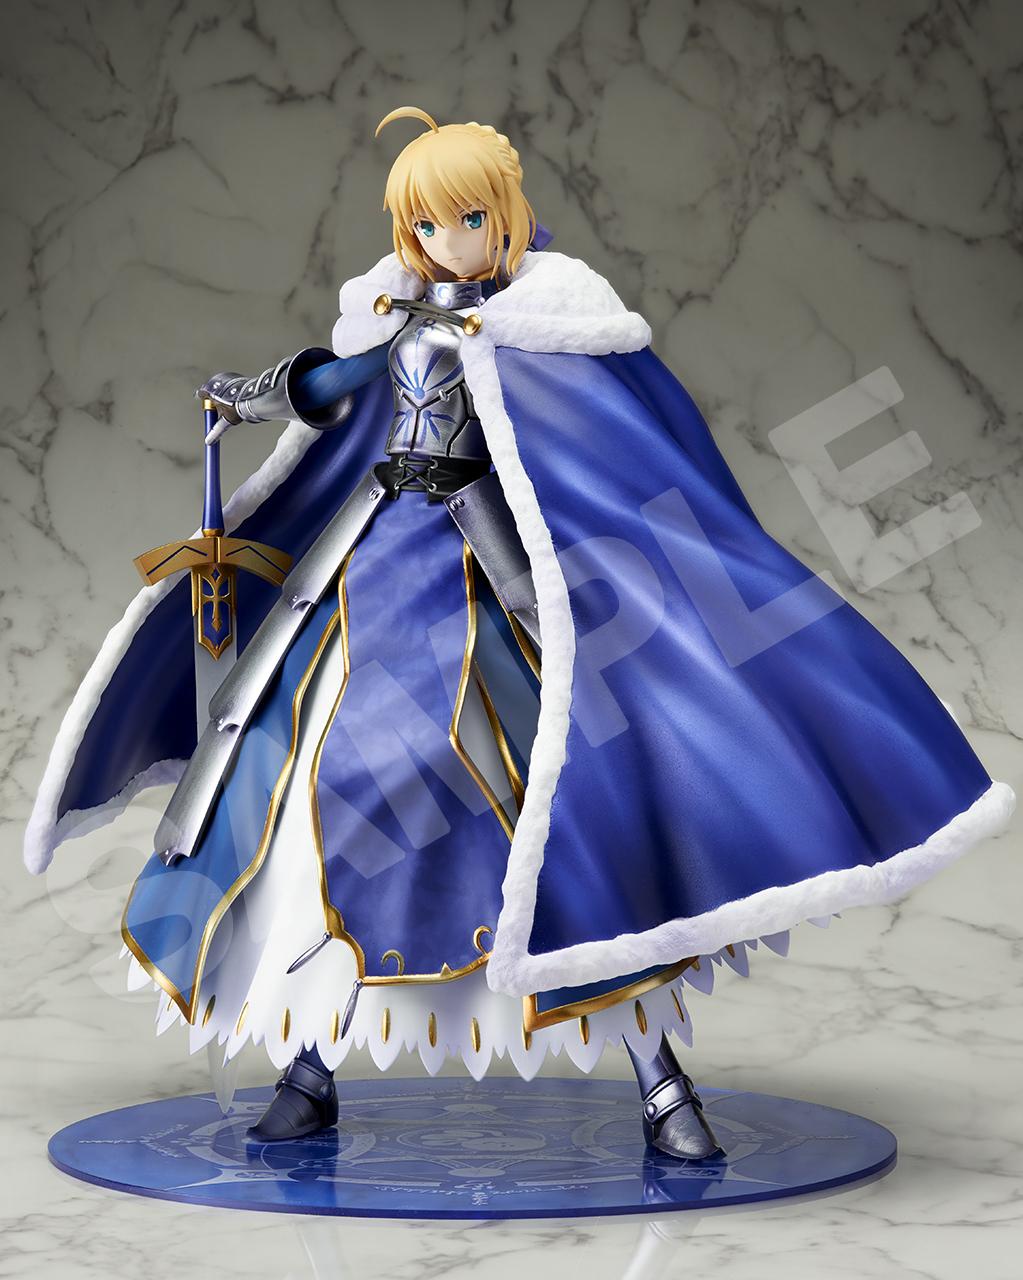 Saber Standard Edition Fate/Grand Order Figure